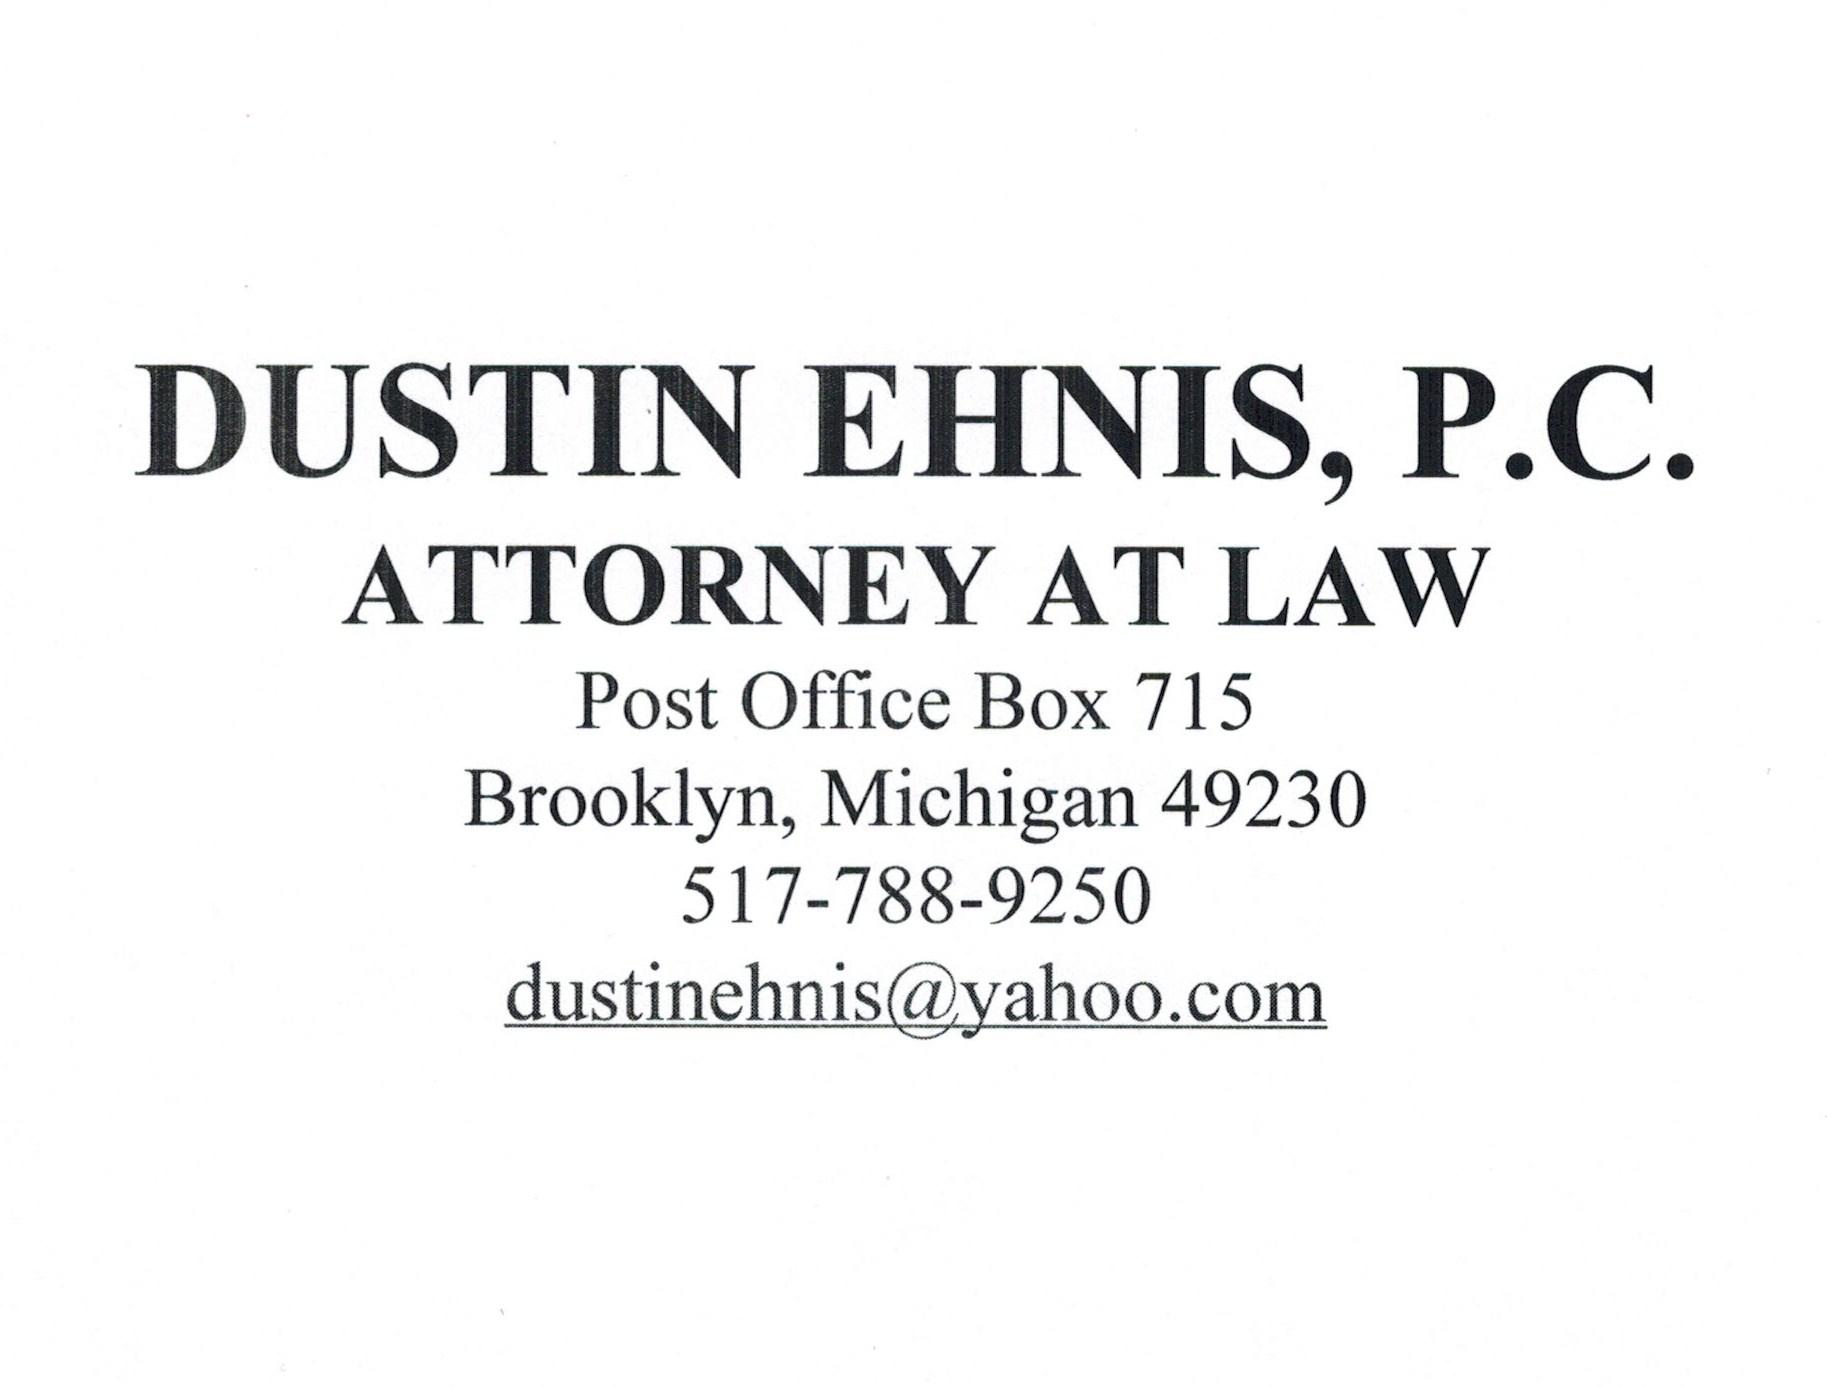 Dustin Ehnis, P.C.